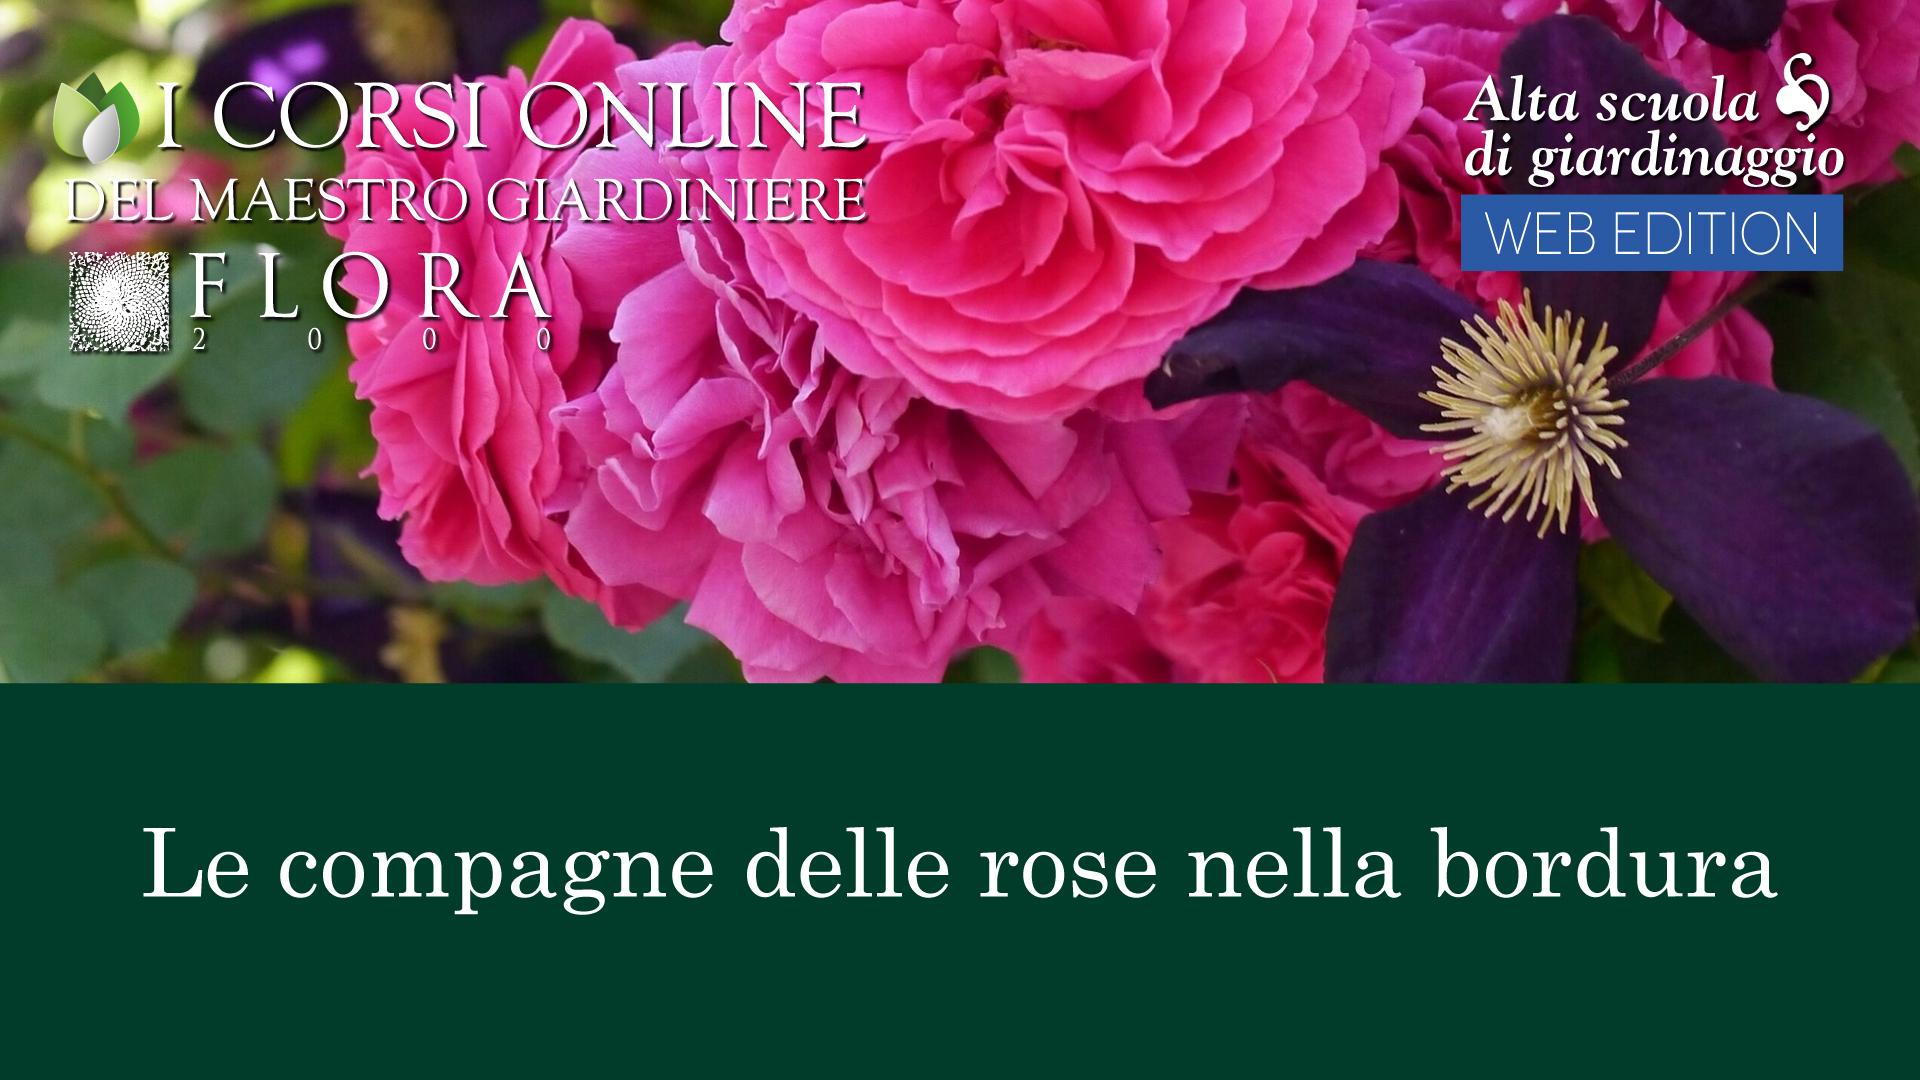 WEB EDITION I CORSI ONLINE  Flora 2000